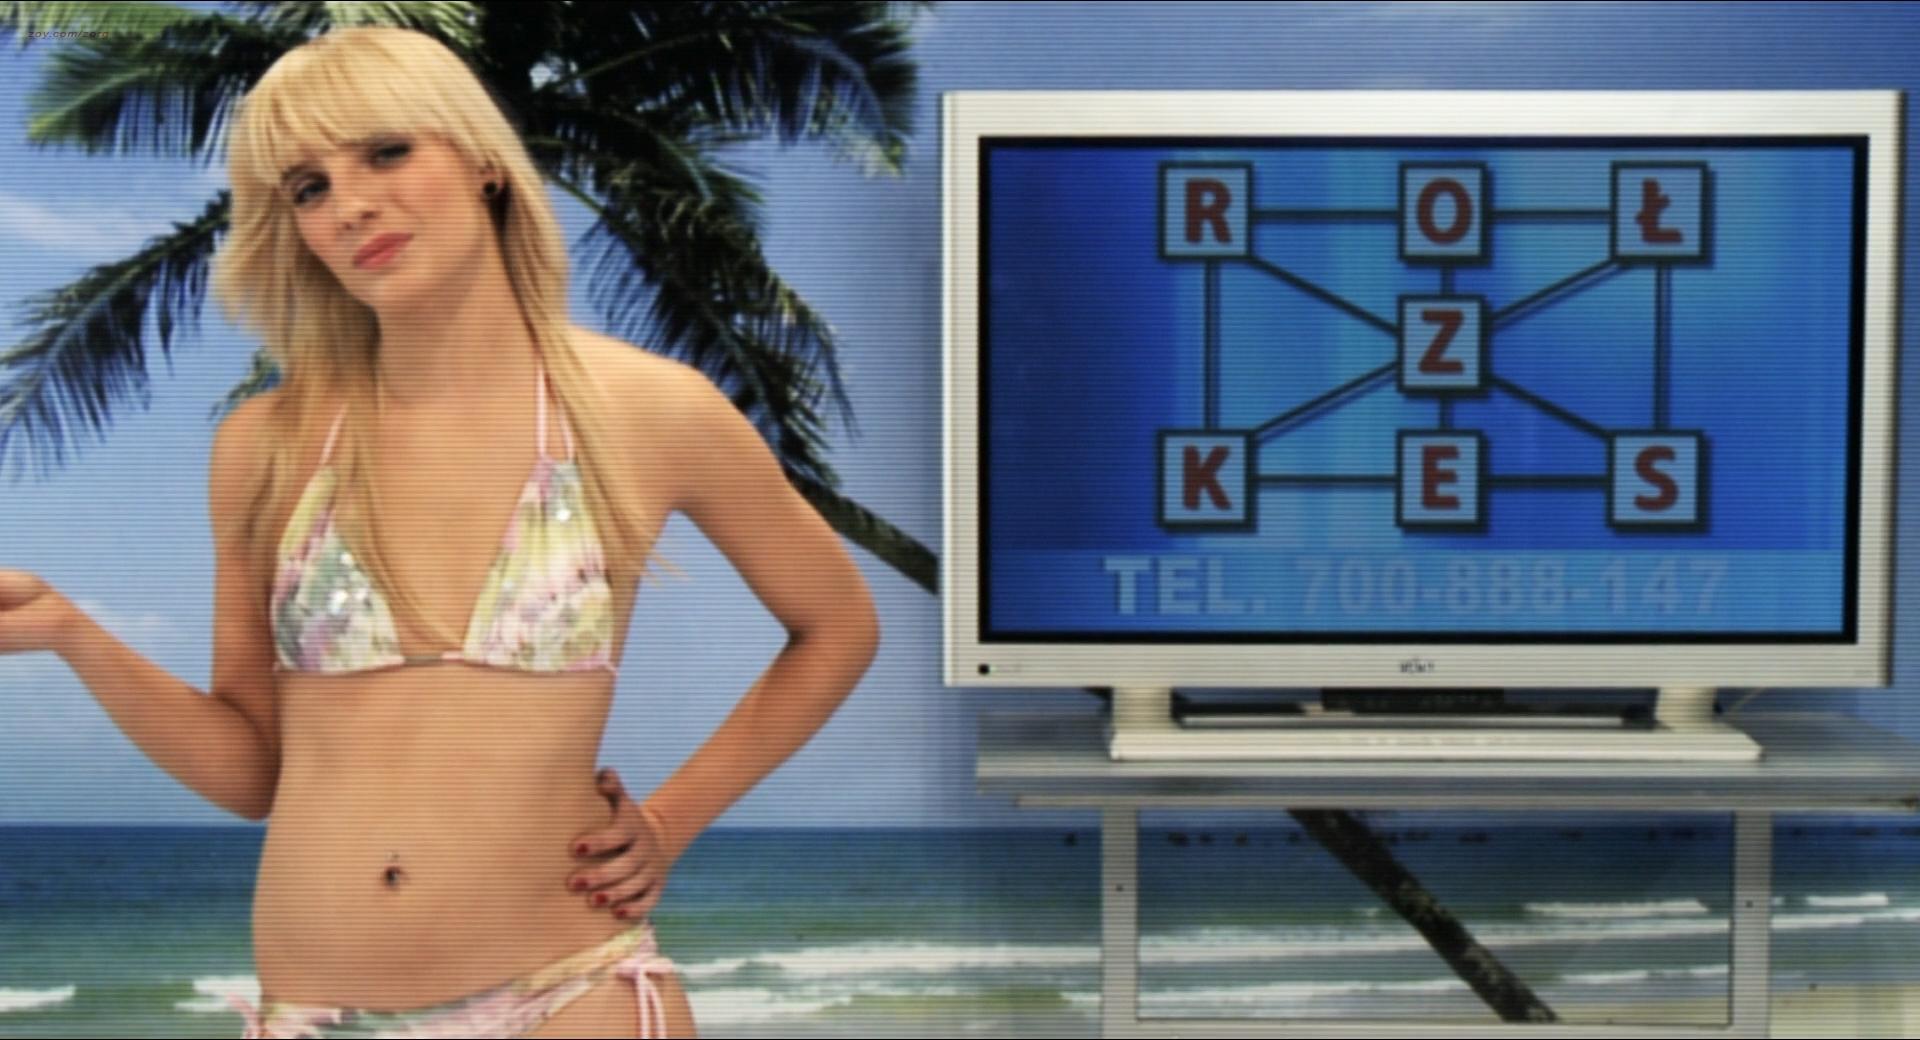 Ewa Matula nude busty boobs Karolina Korta hot others nude butt - Onirica (PL-2014) HD 1080p BluRay (6)